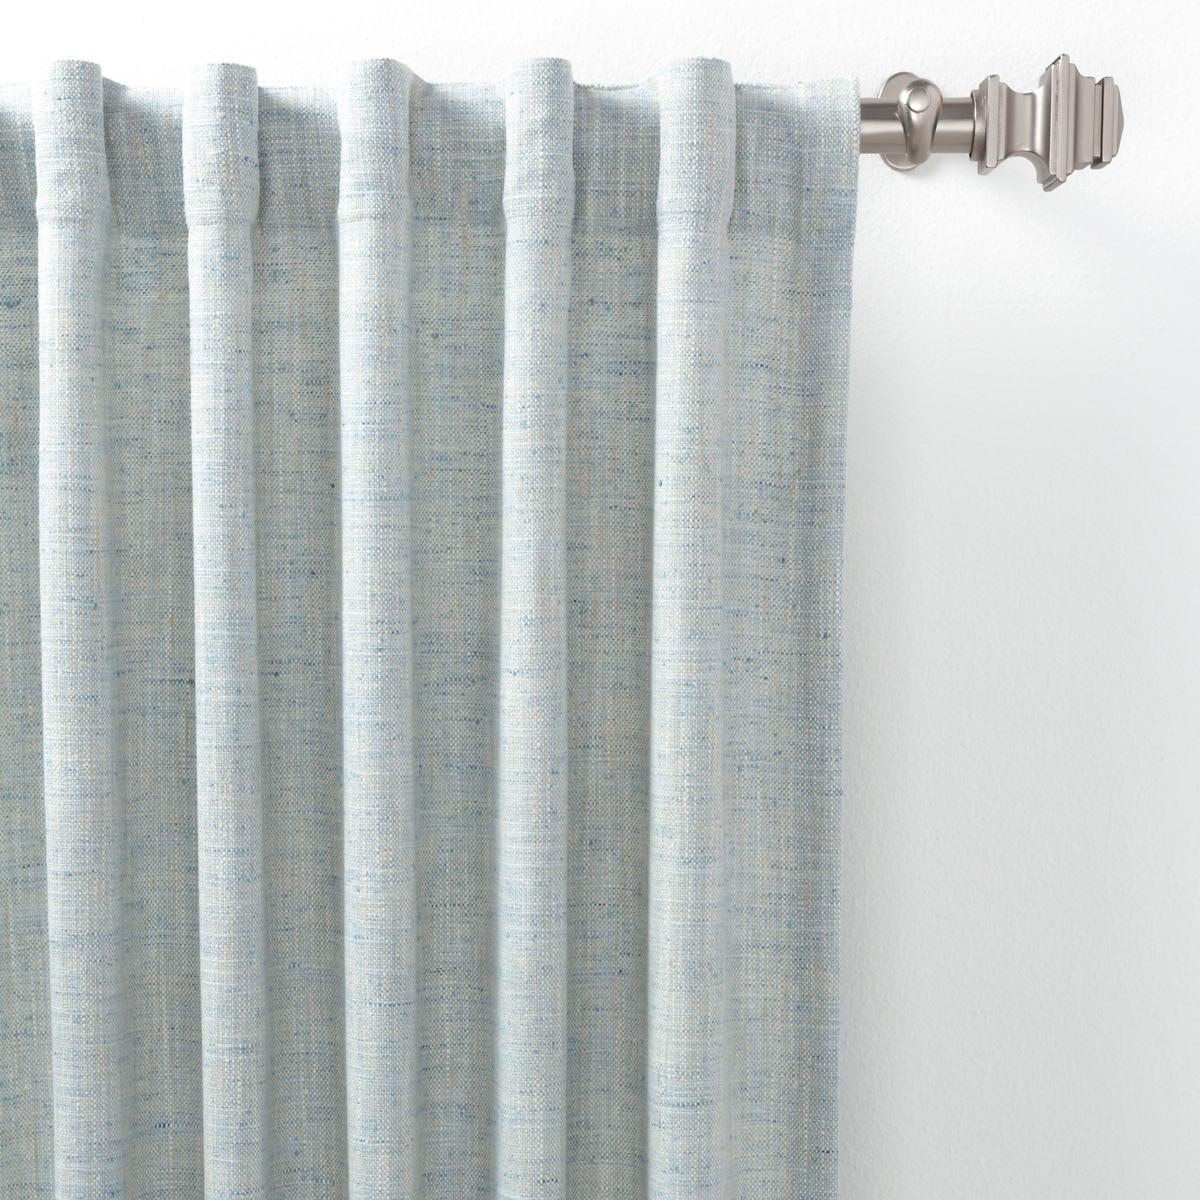 Greylock Soft Blue Indoor/Outdoor Curtain Panel